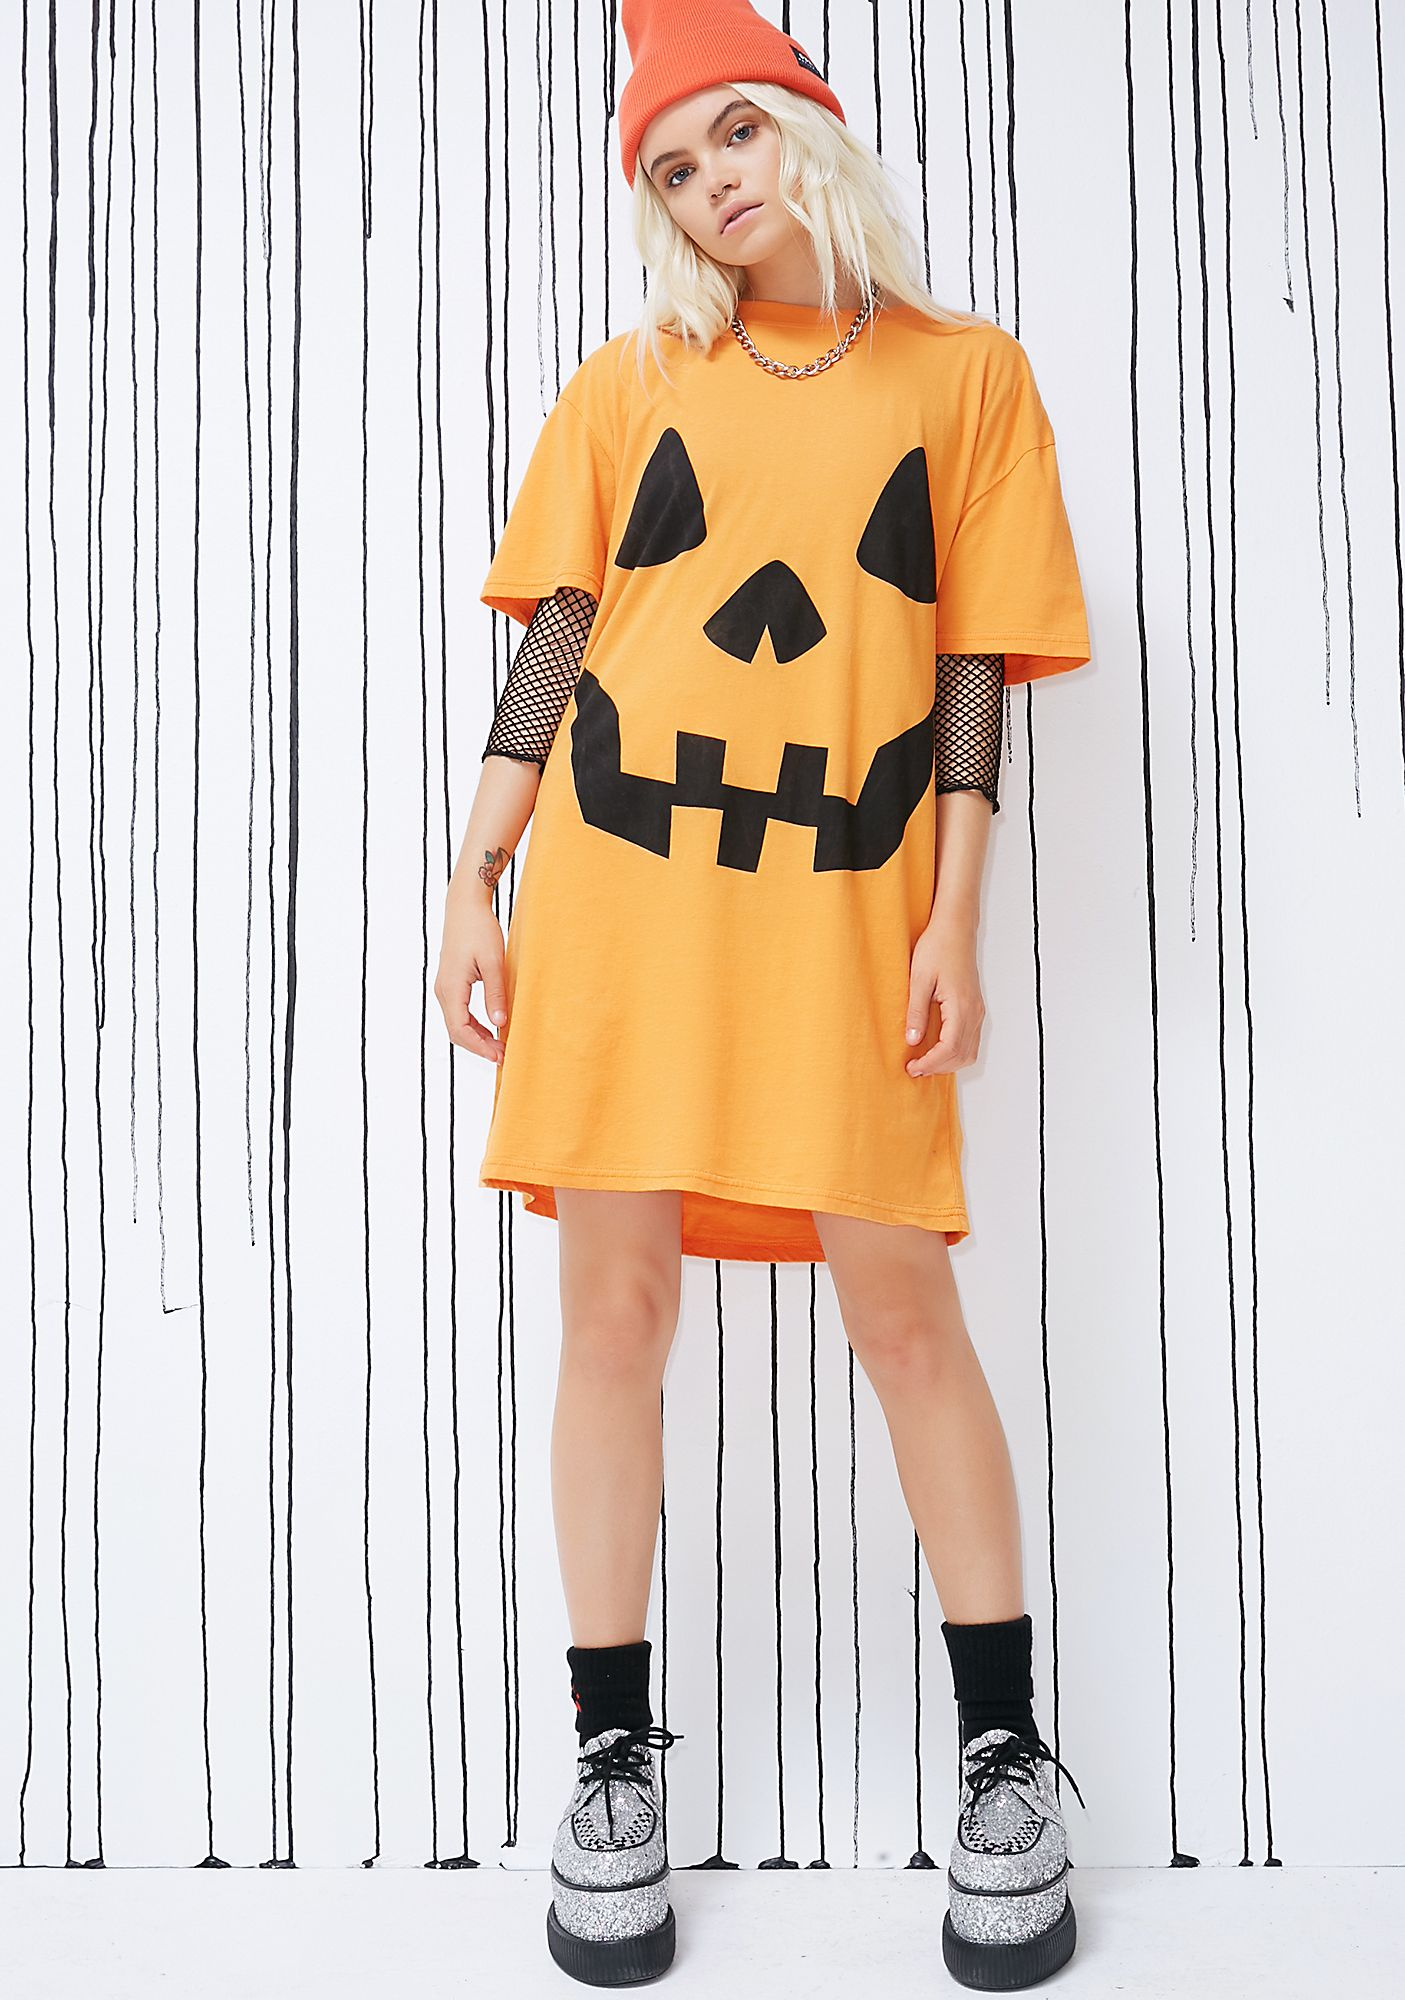 Jack O Lantern Tee Lantern Tee Cool Outfits Fashion